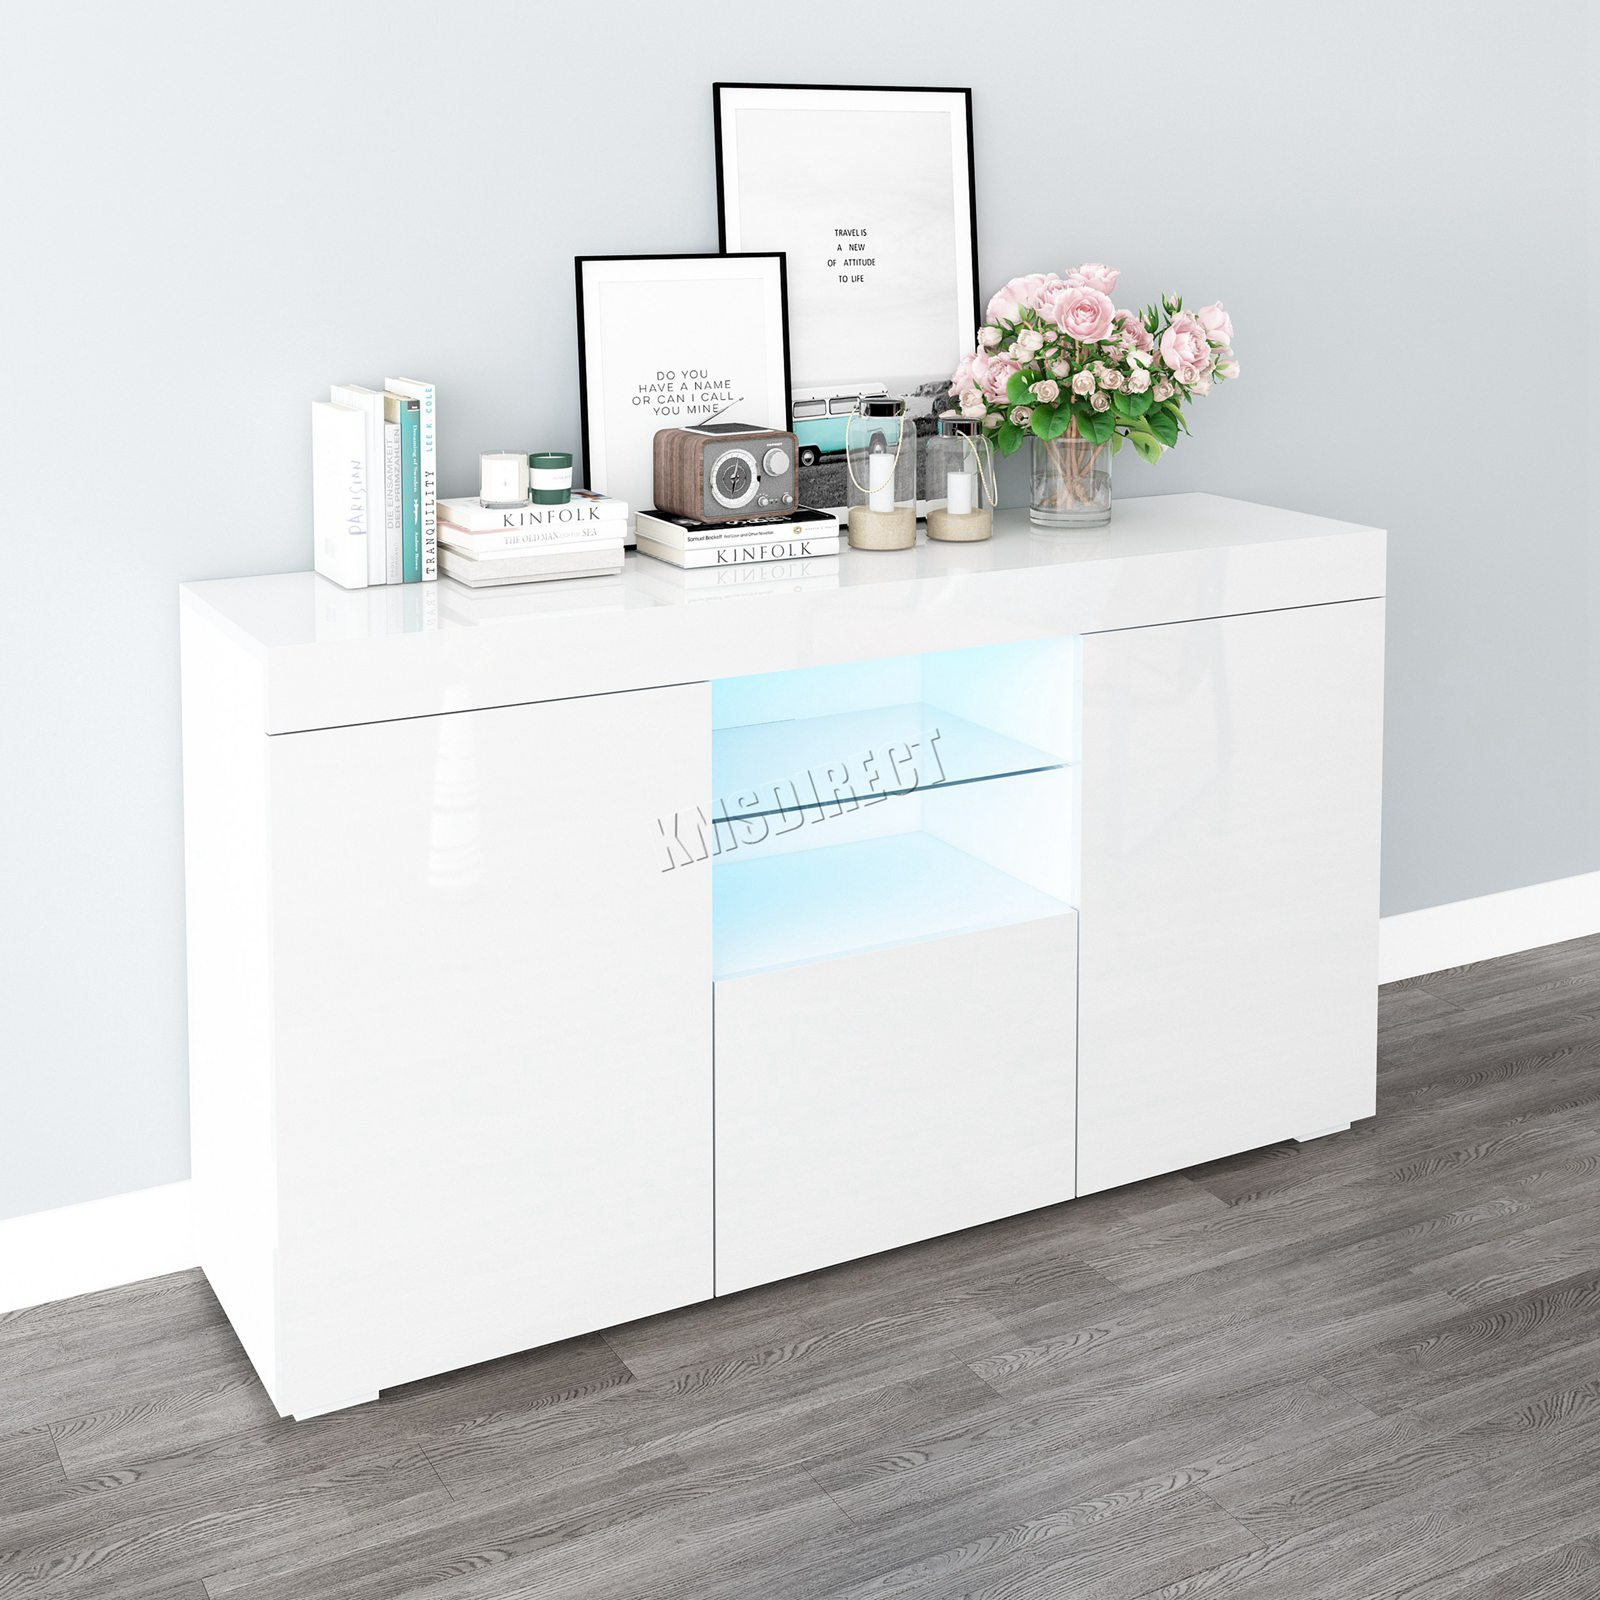 WestWood-PB-High-Gloss-Cabinet-LED-Bookshelf-Sideboard-Cupboard-Home-Unit-PHC03 thumbnail 32